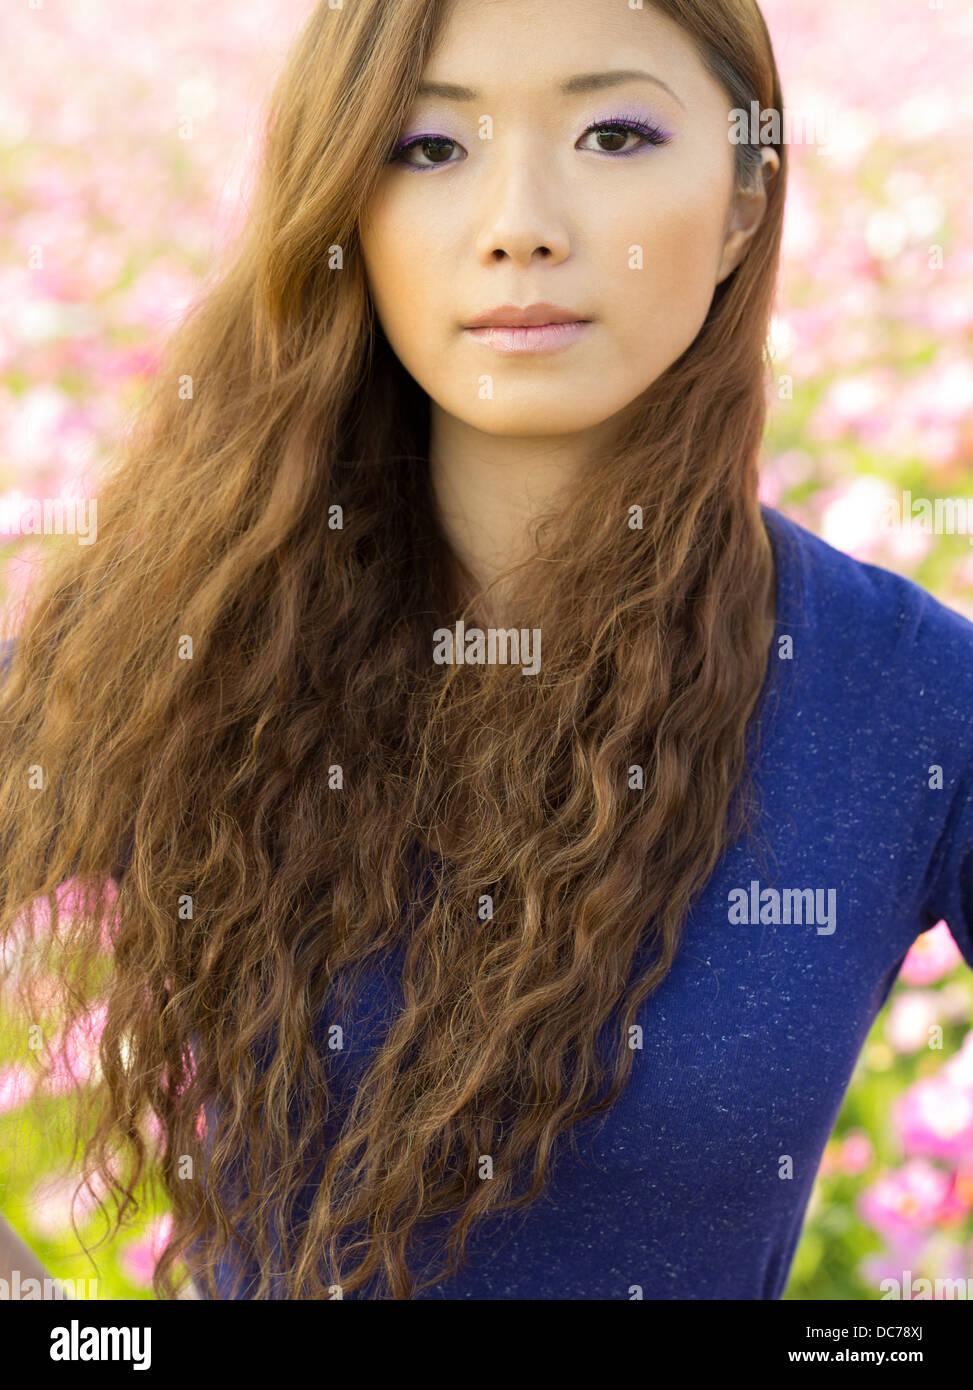 Beautiful Japanese Girl In Field Of Cosmos Flowers, Kin-2652